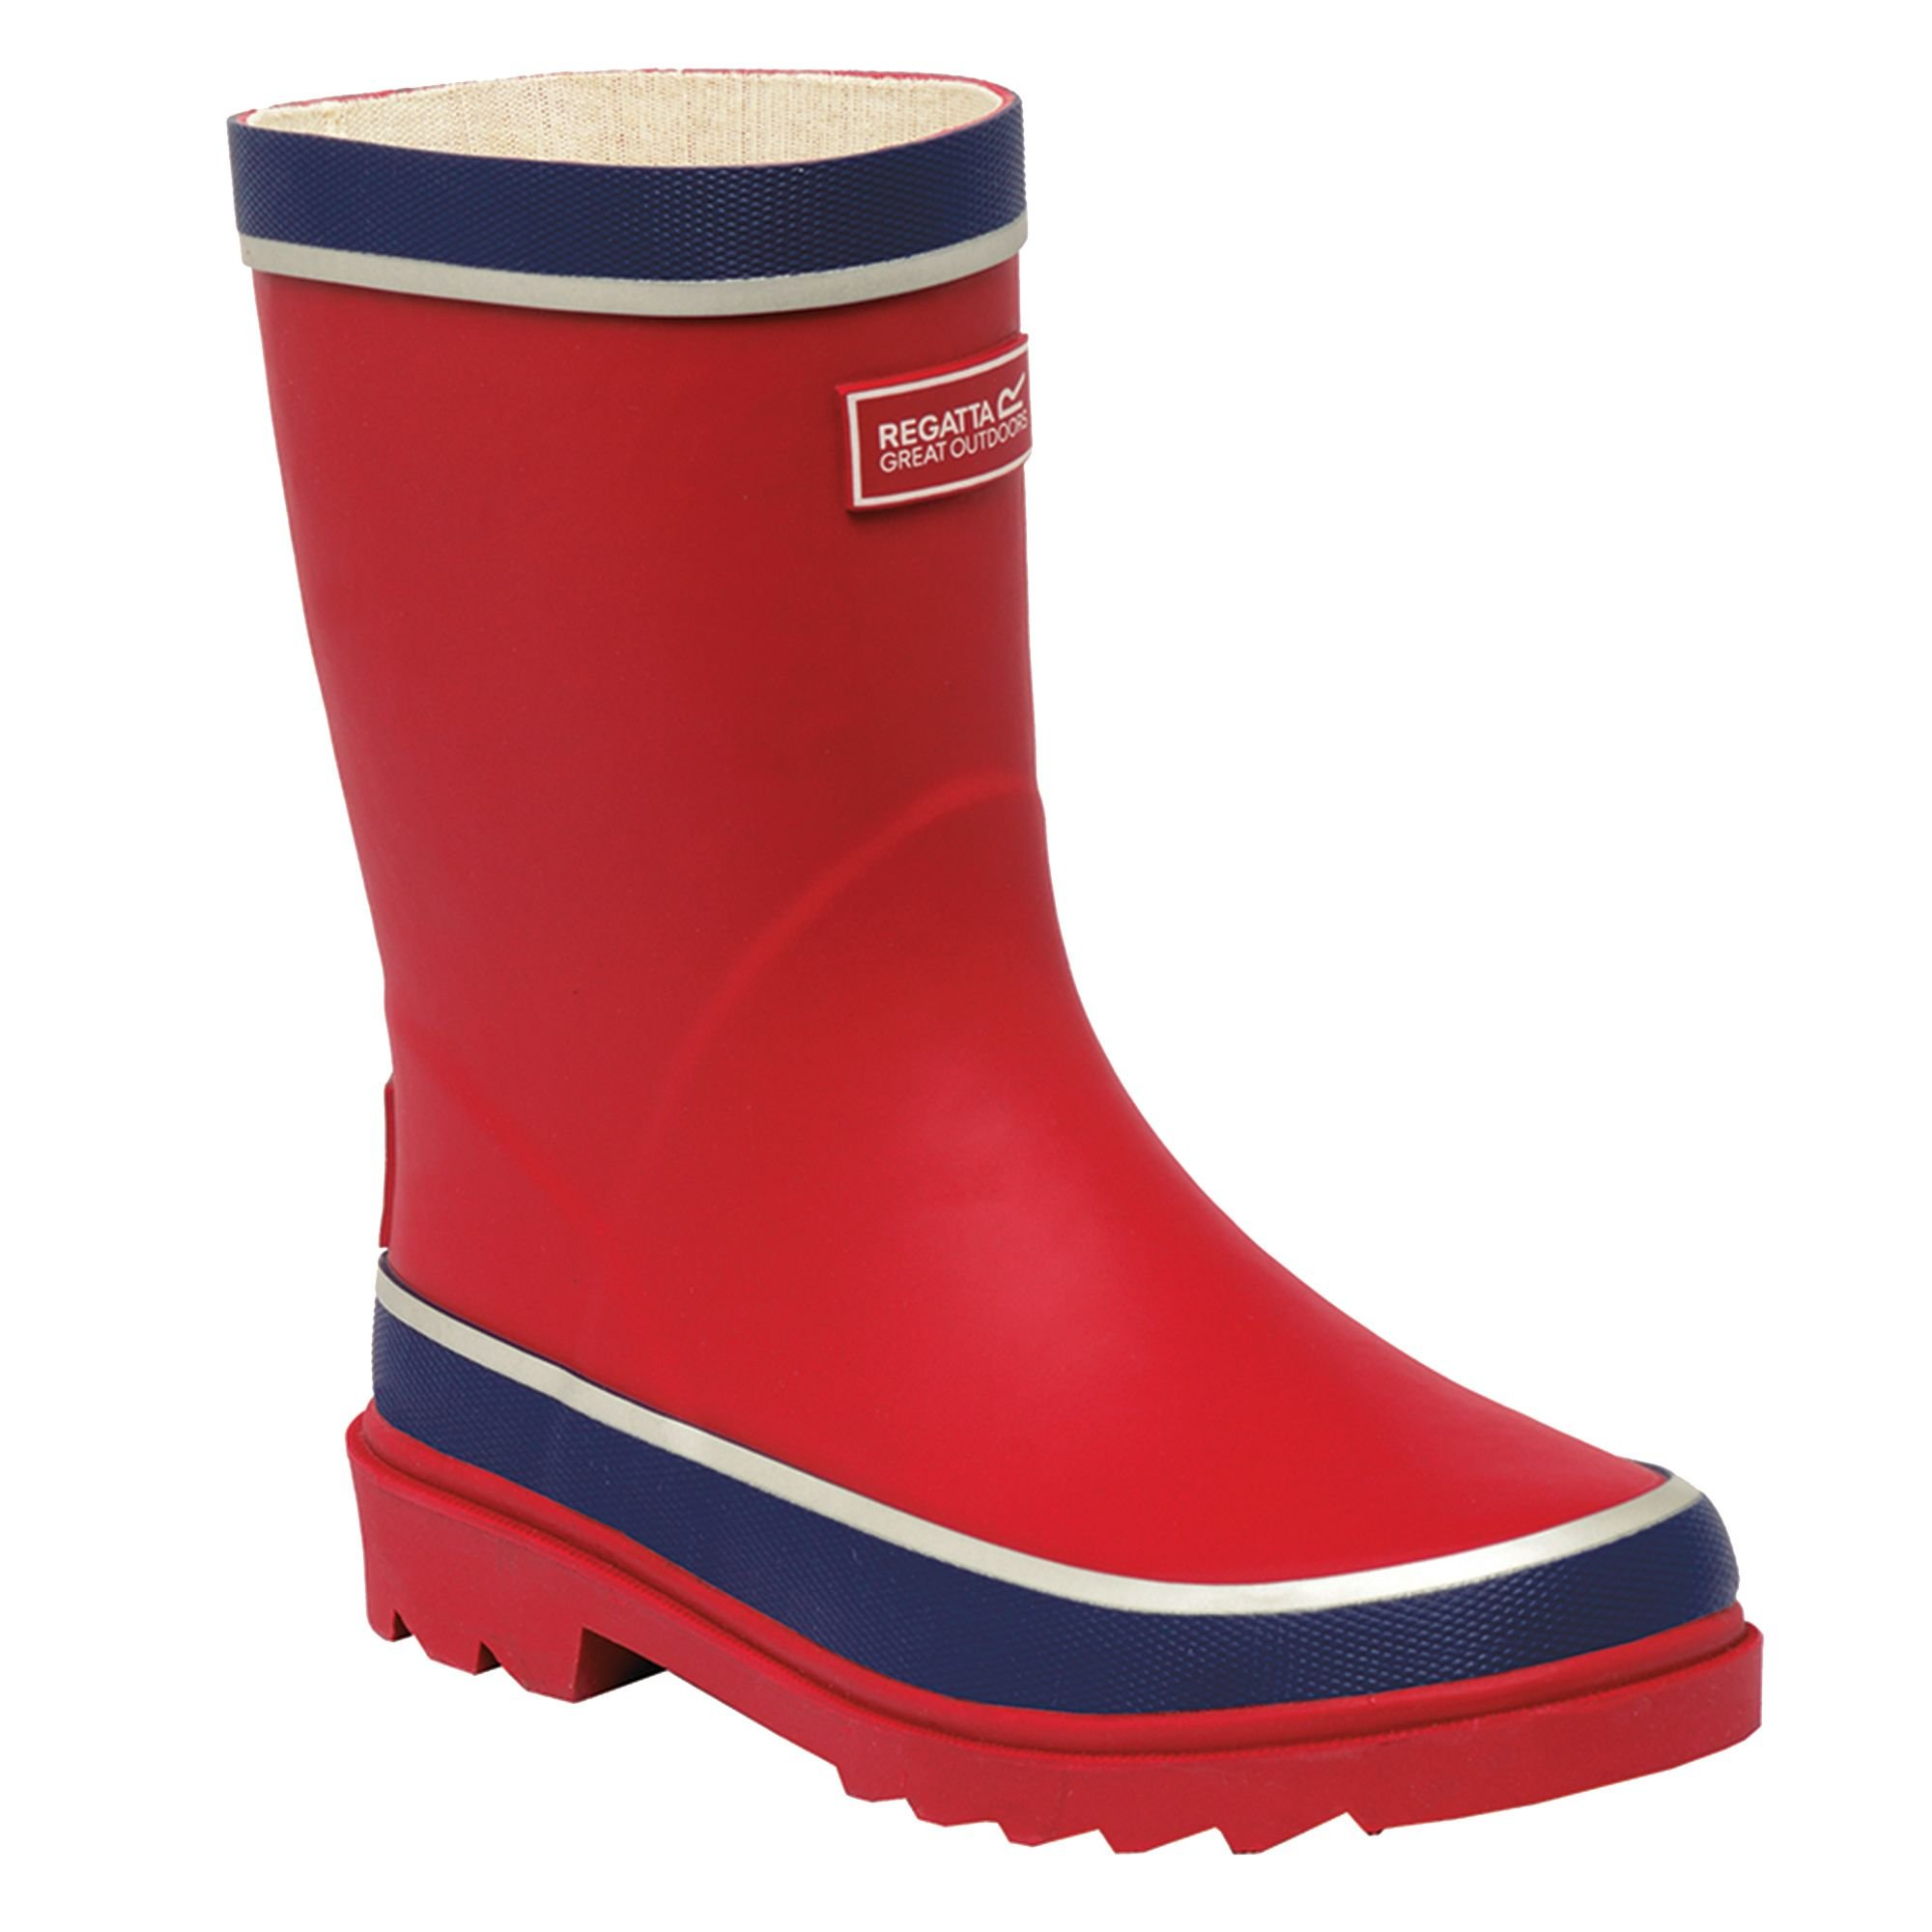 Regatta Great Outdoors Childrens/Kids Foxfire Wellington Boots (US Child 11) (Lime Punch/Navy)